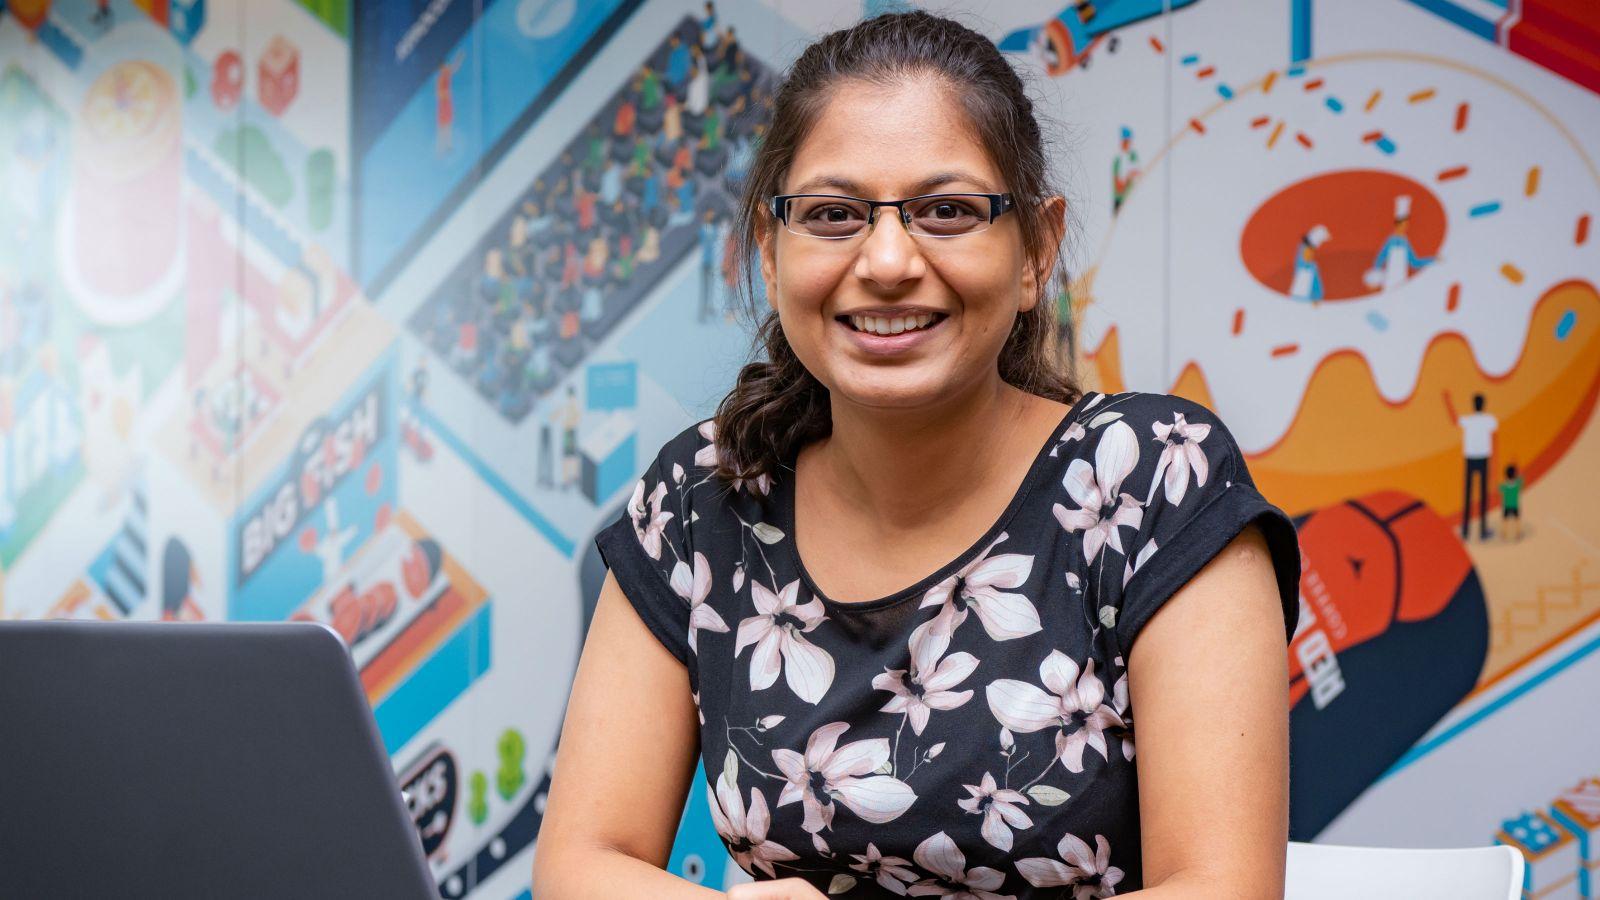 Divya Patel at her desk at Xero.